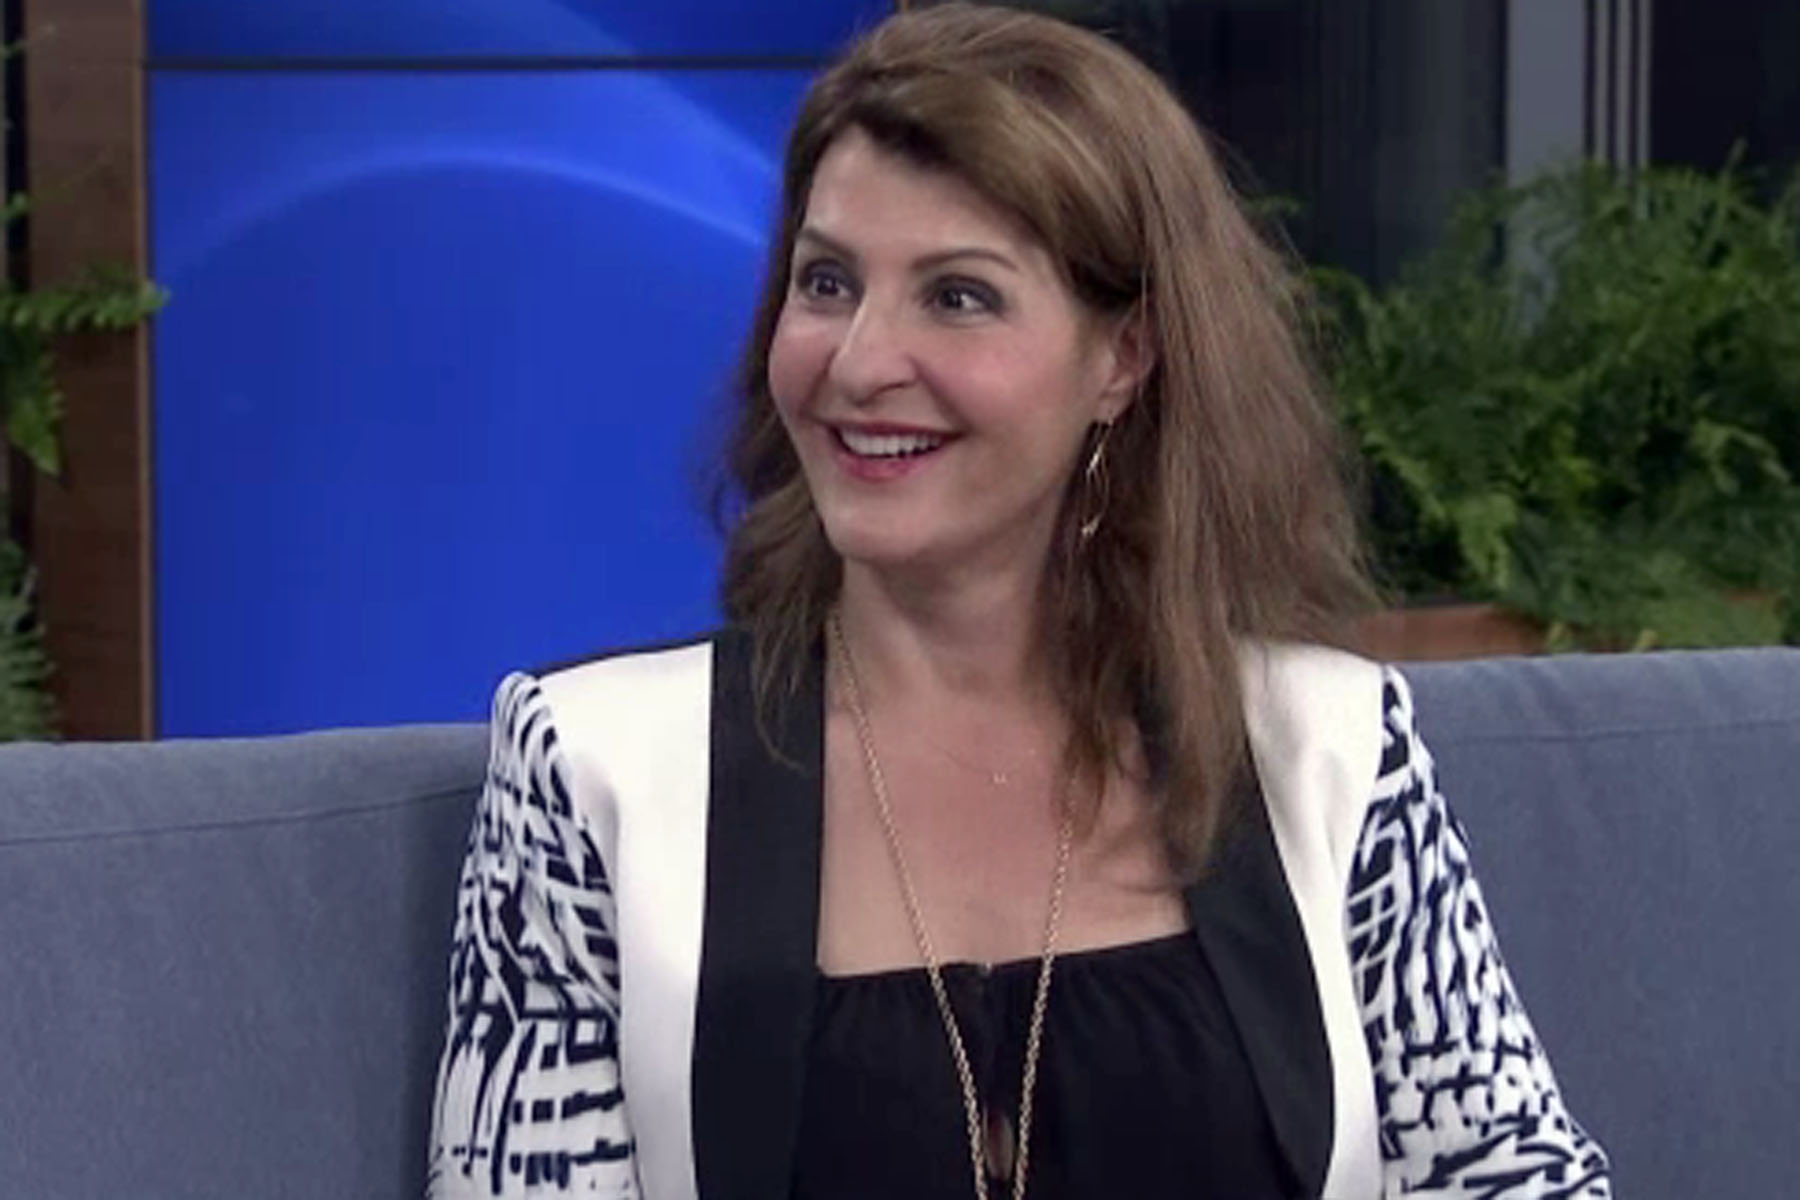 nia vardalos talks infertility adoption in new book